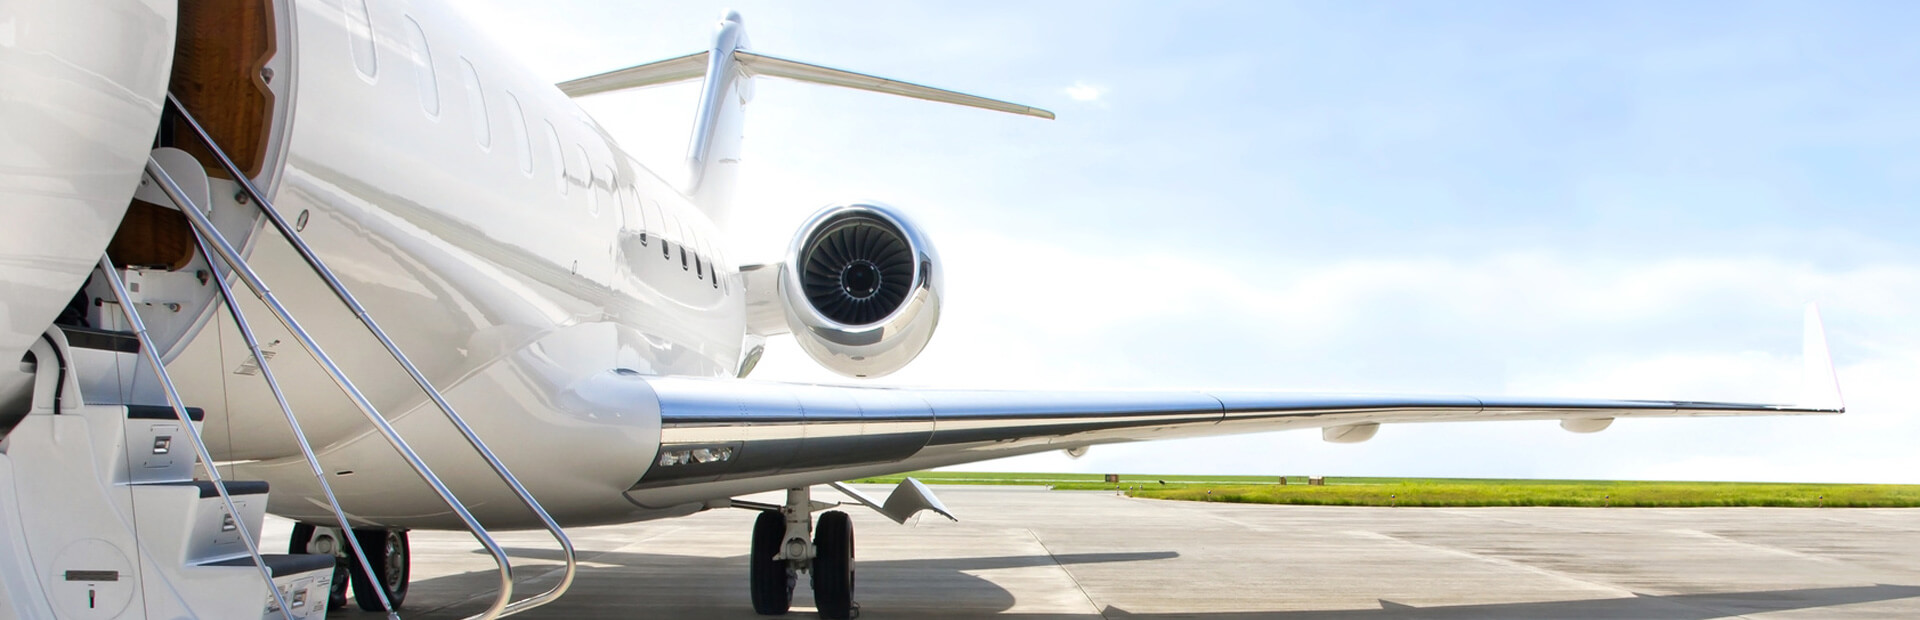 Private Plane Travel and Logistics